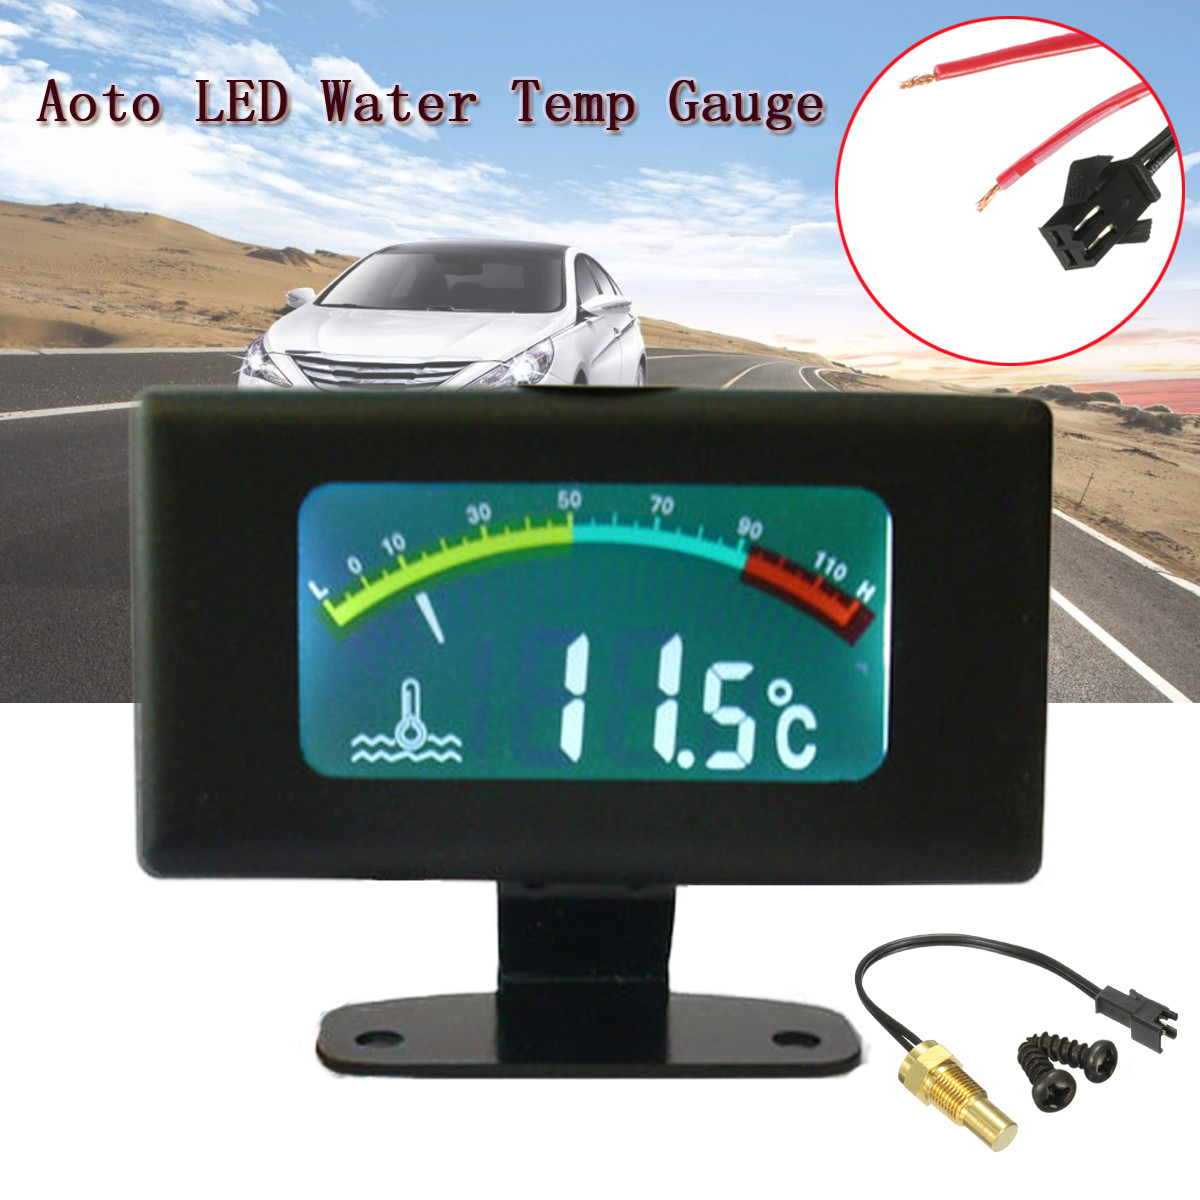 12V / 24V / 36V DC Digital LED Car Water Temp Gauge Automotive Accessories Water Temperature Meter 10mm thread sensor